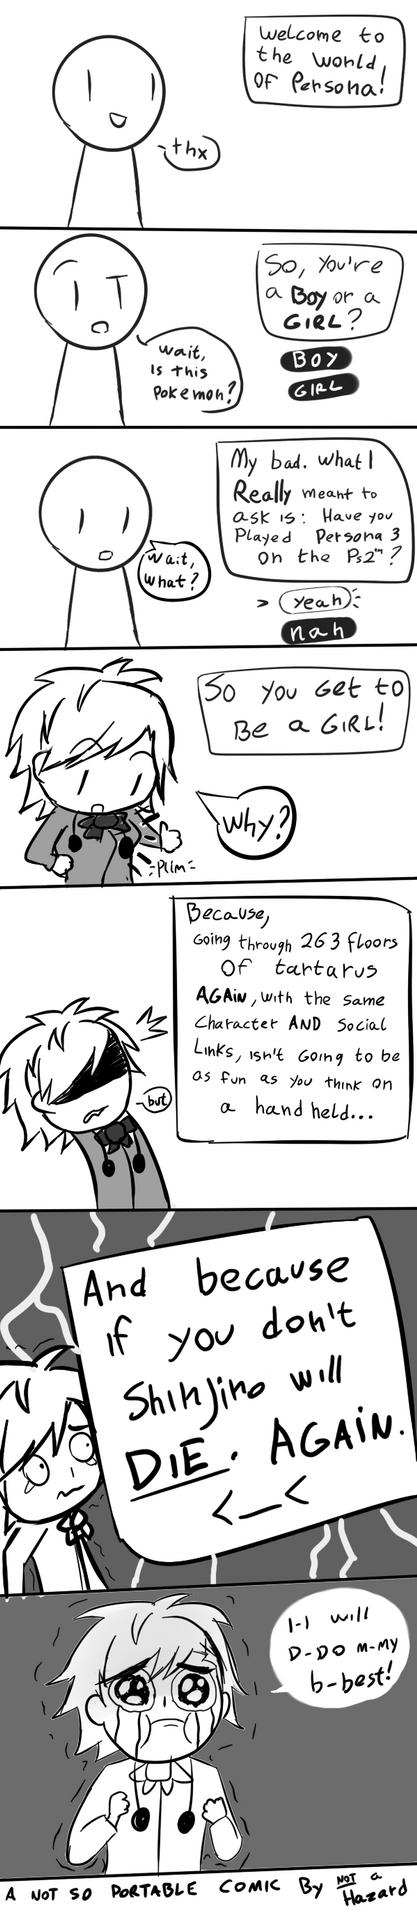 A not so Portable comic 1 by Not-a-Hazard